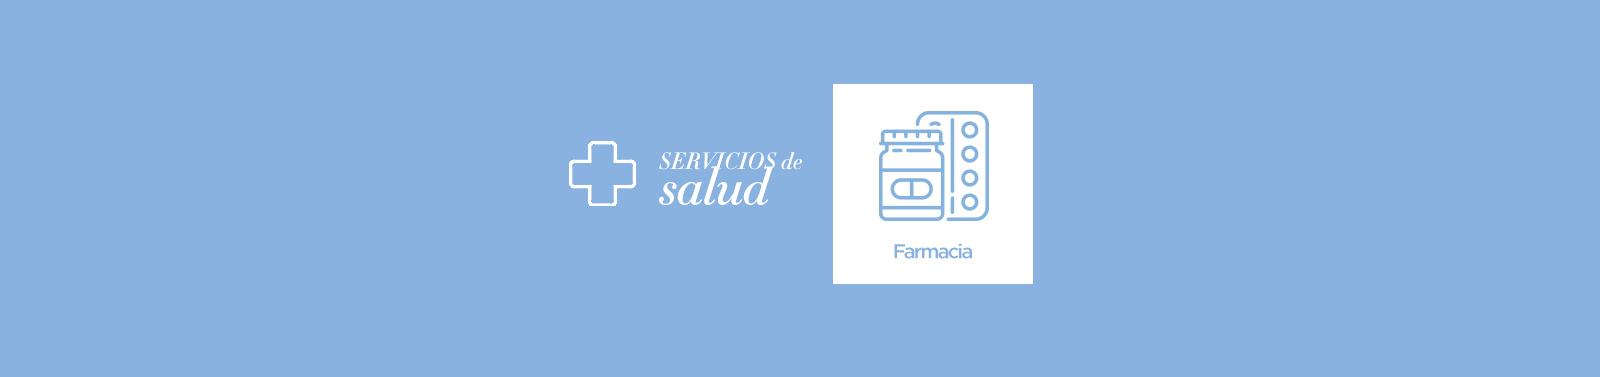 servicios-farmacia-5